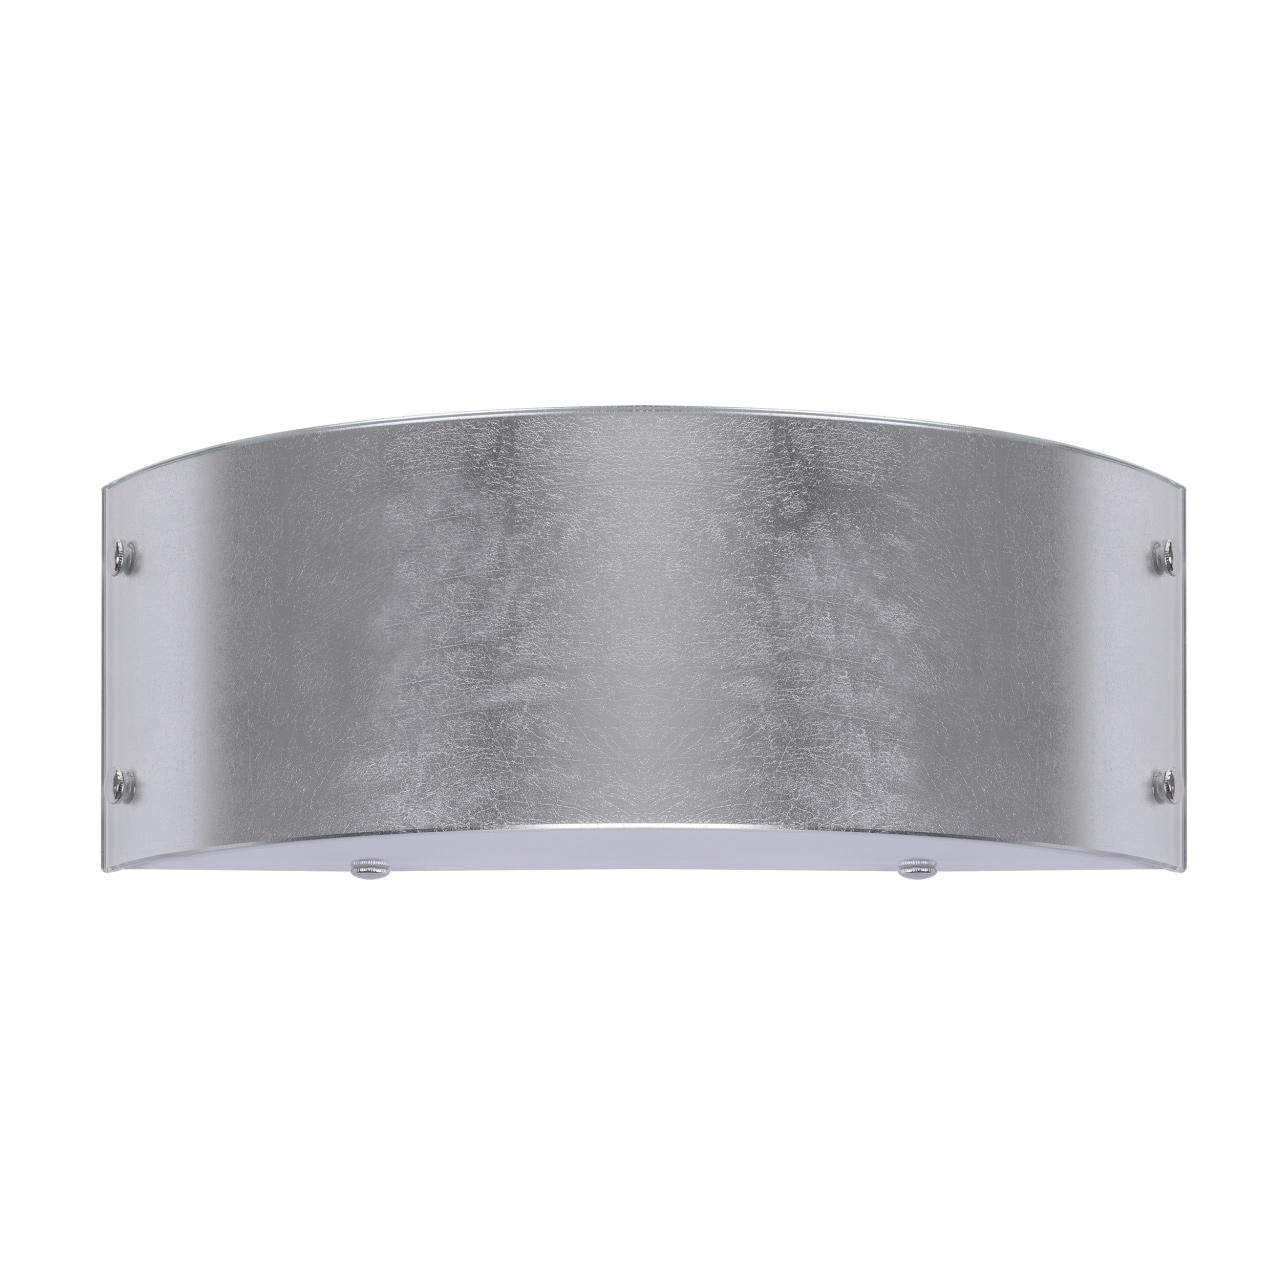 Бра Cupola 2х40W E14 silver Lightstar 803524